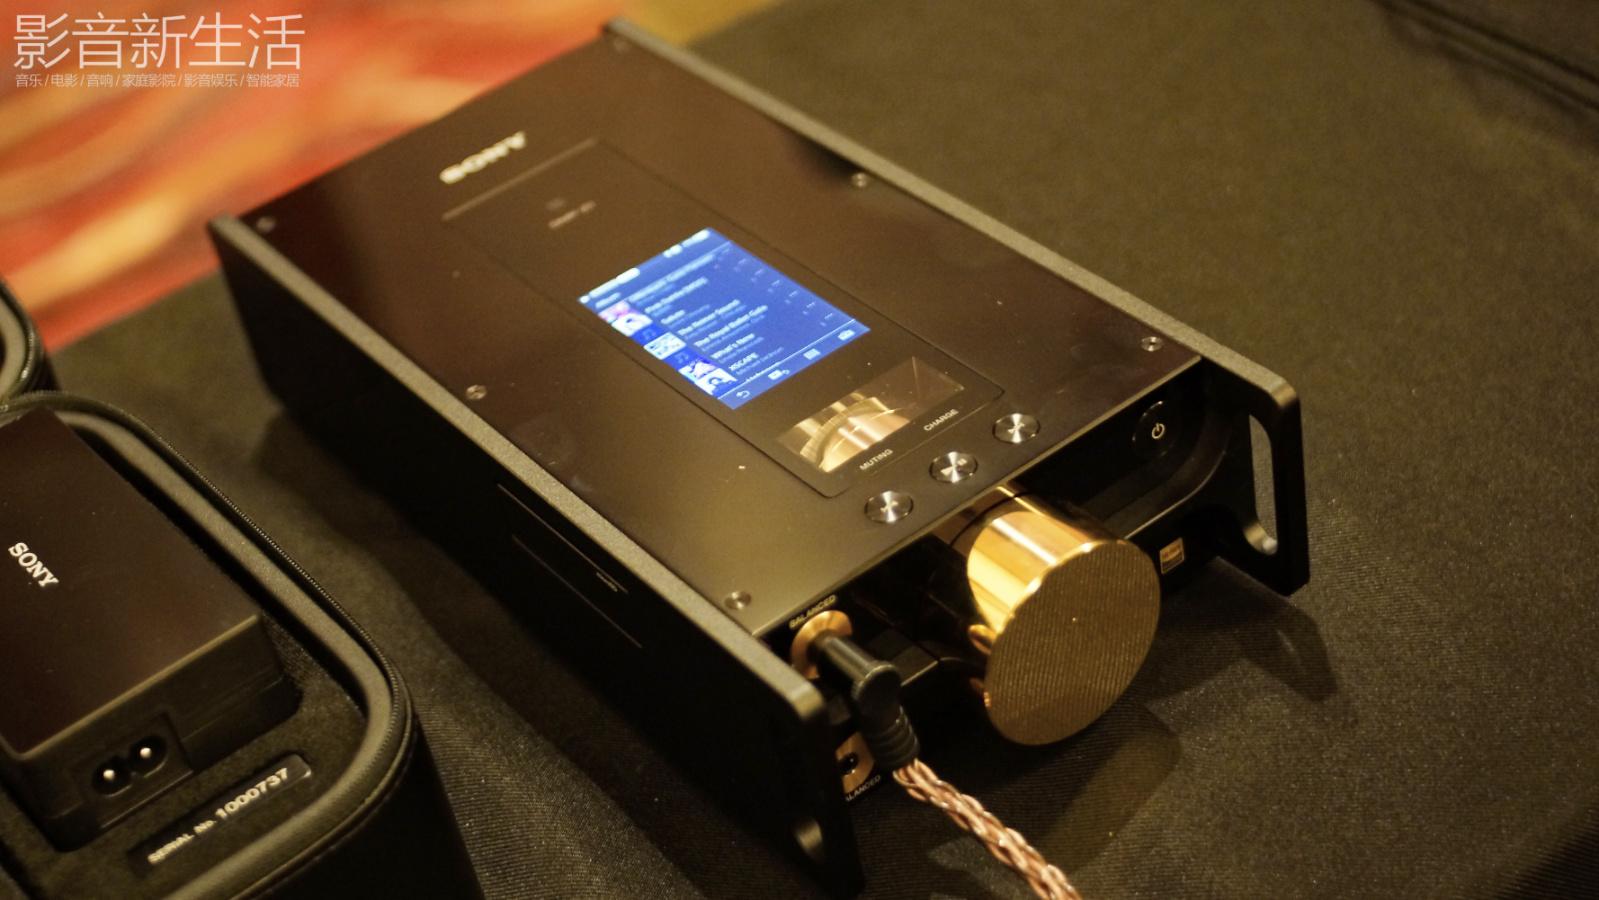 "Sony Hi Res 2018 54 - 新品 | ""重塑随身音乐娱乐王朝!"":Sony索尼发布Signature醇音系列新兄弟IER-Z1R和DMP-Z1,以及舞台监听耳机系列:IER-M7和IER-M9,还有升级款MDR-Z7M2!"